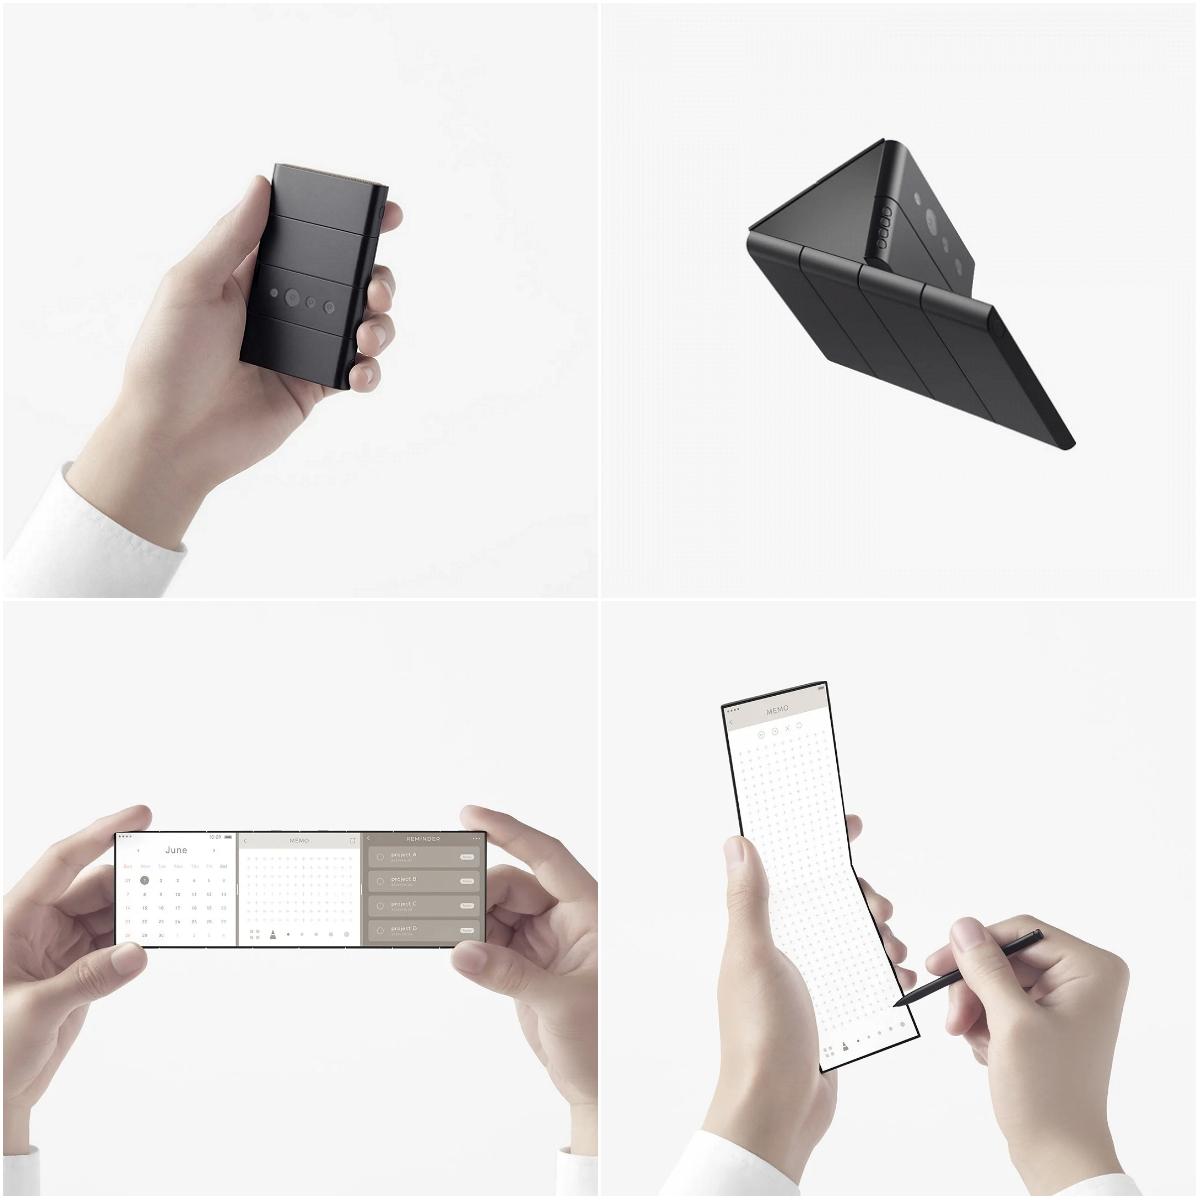 Слайдфон Oppo в разных ракурсах